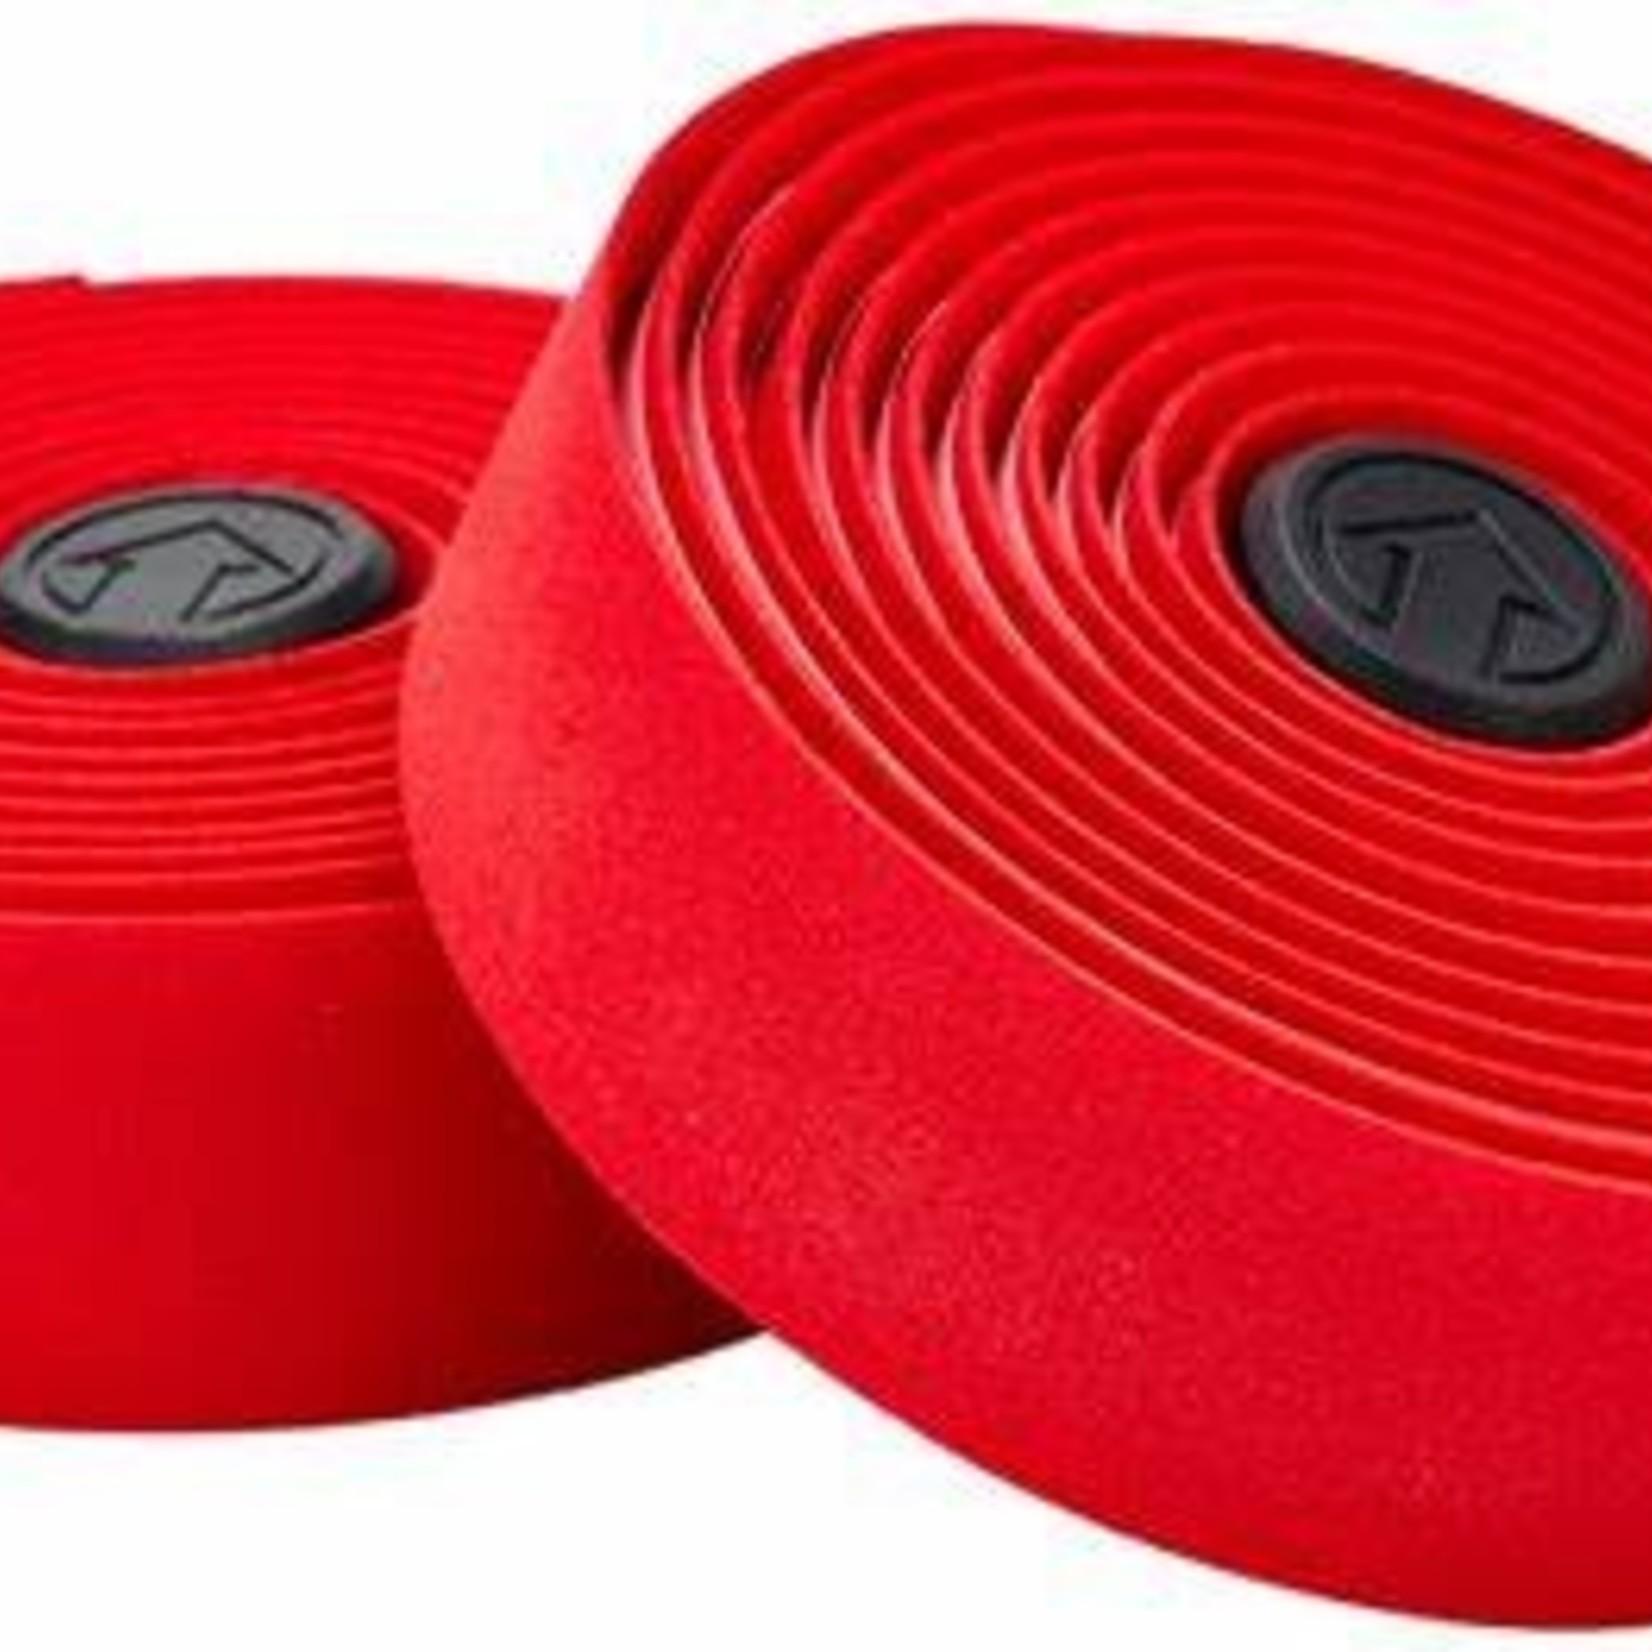 Pro 'smart silicon' Handlebar tape